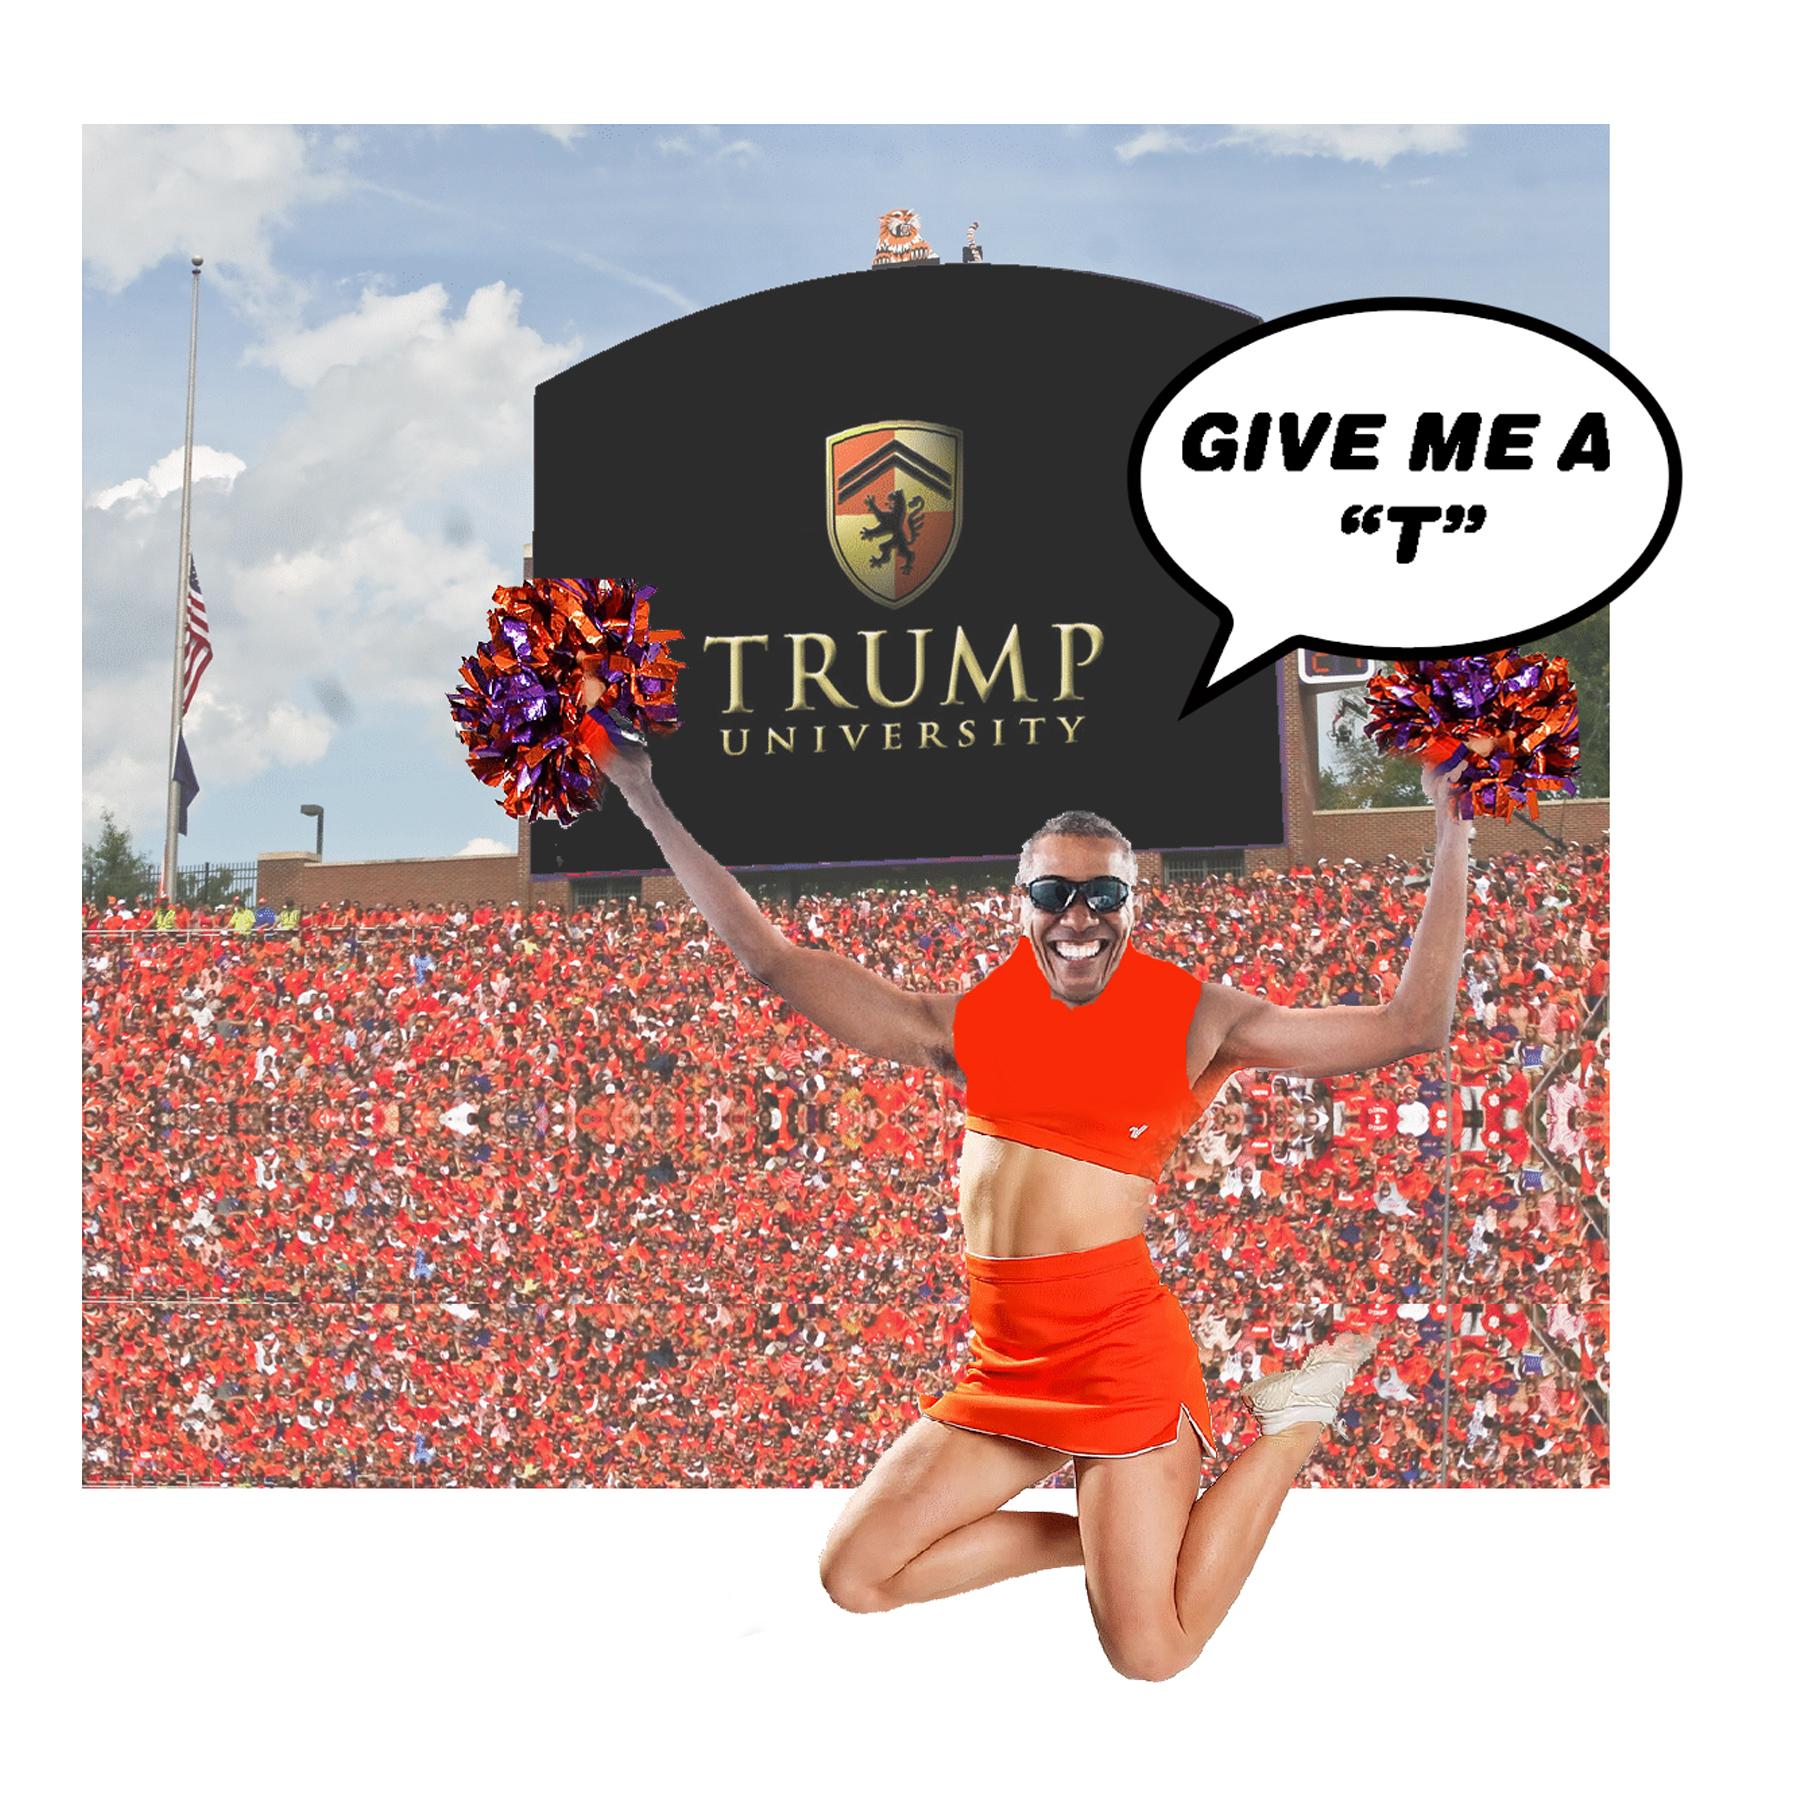 cheering Trump University?